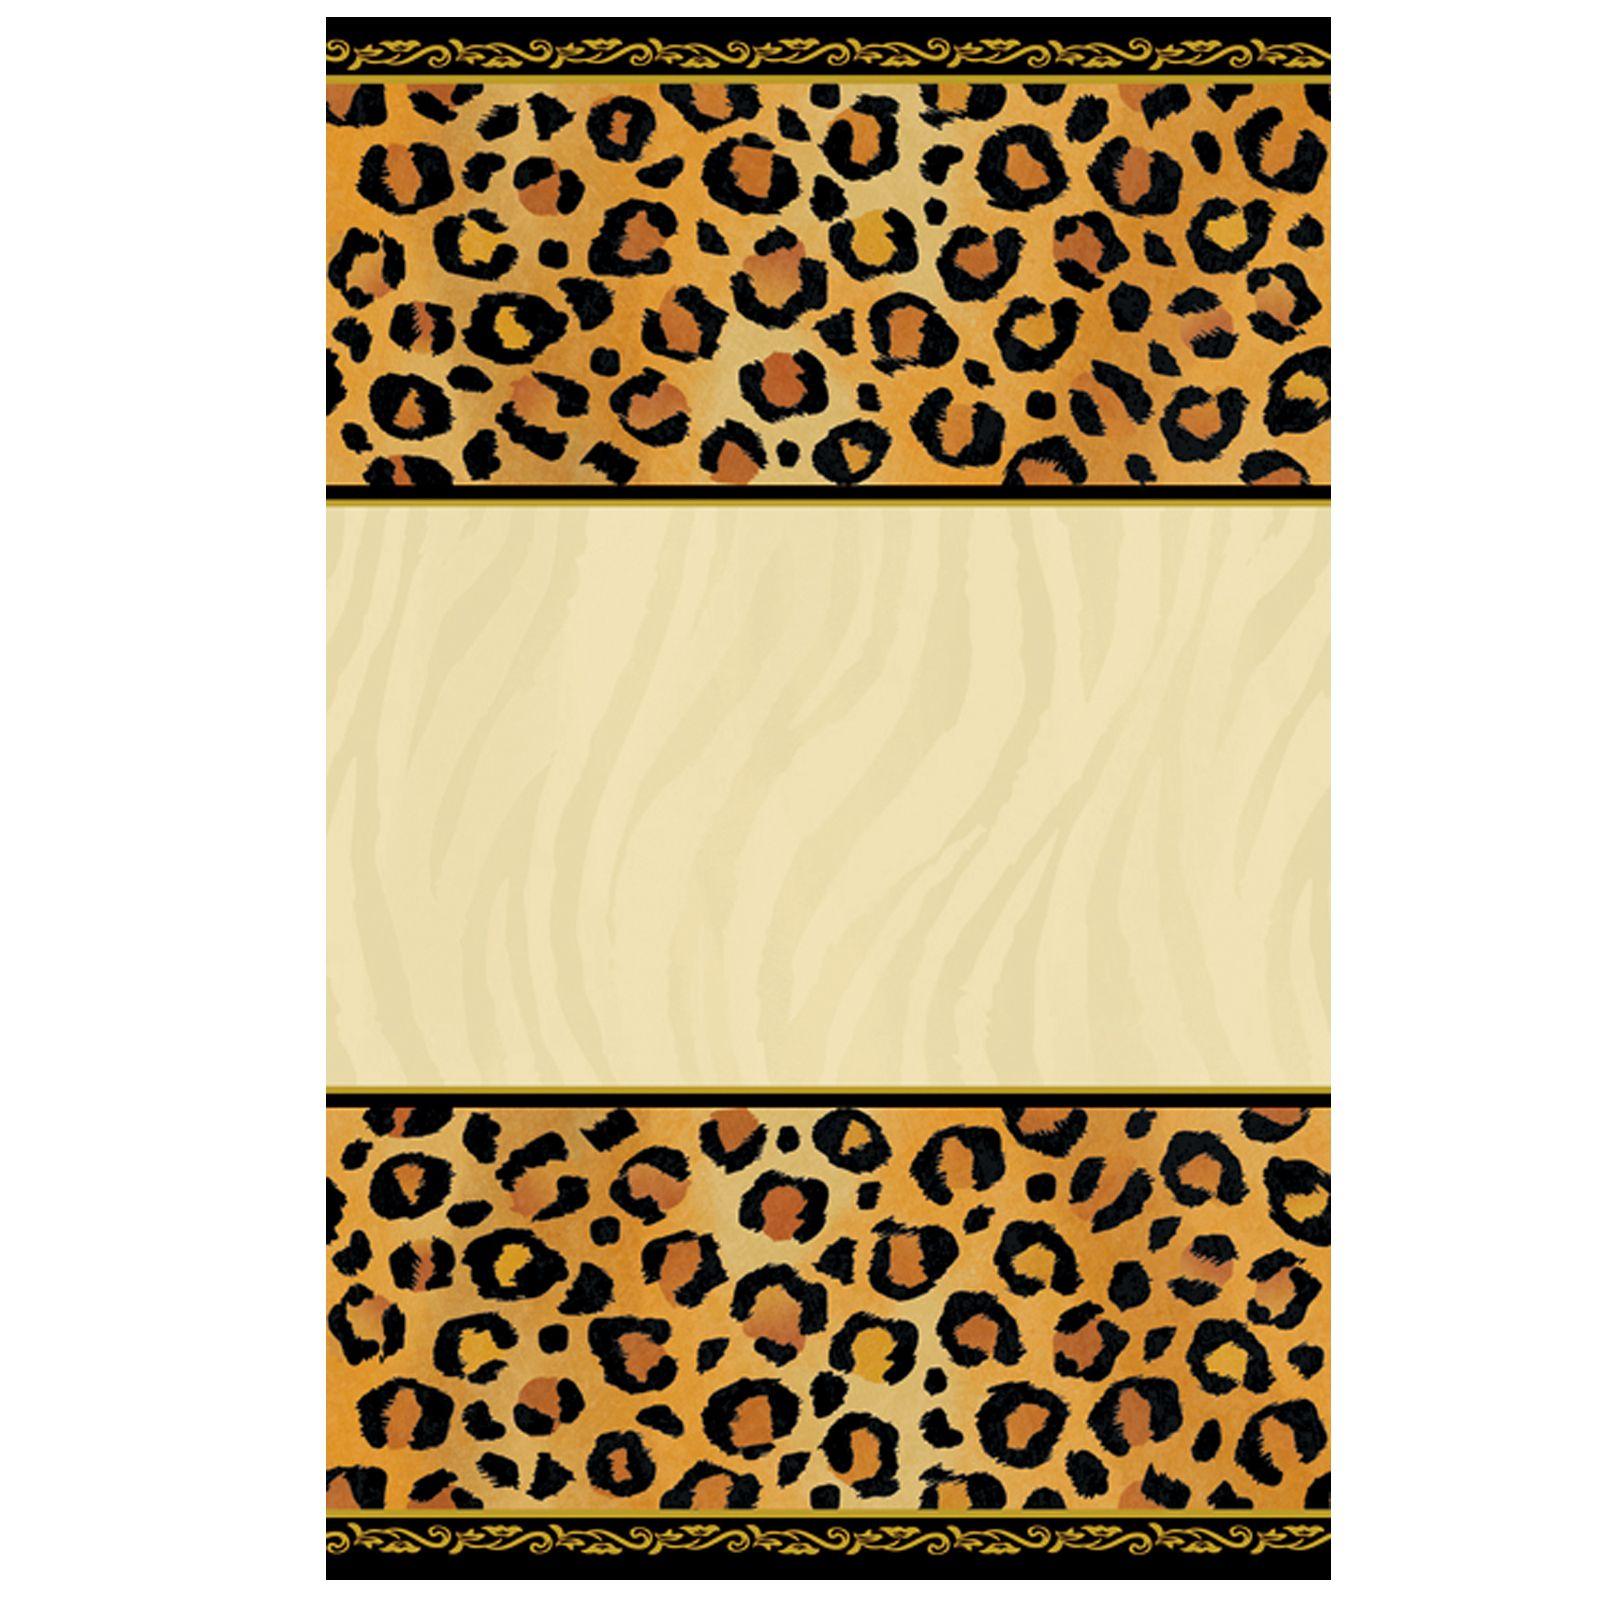 Leopard Print Invitations Printable Free Cakepins | Printables - Free Printable Cheetah Birthday Invitations